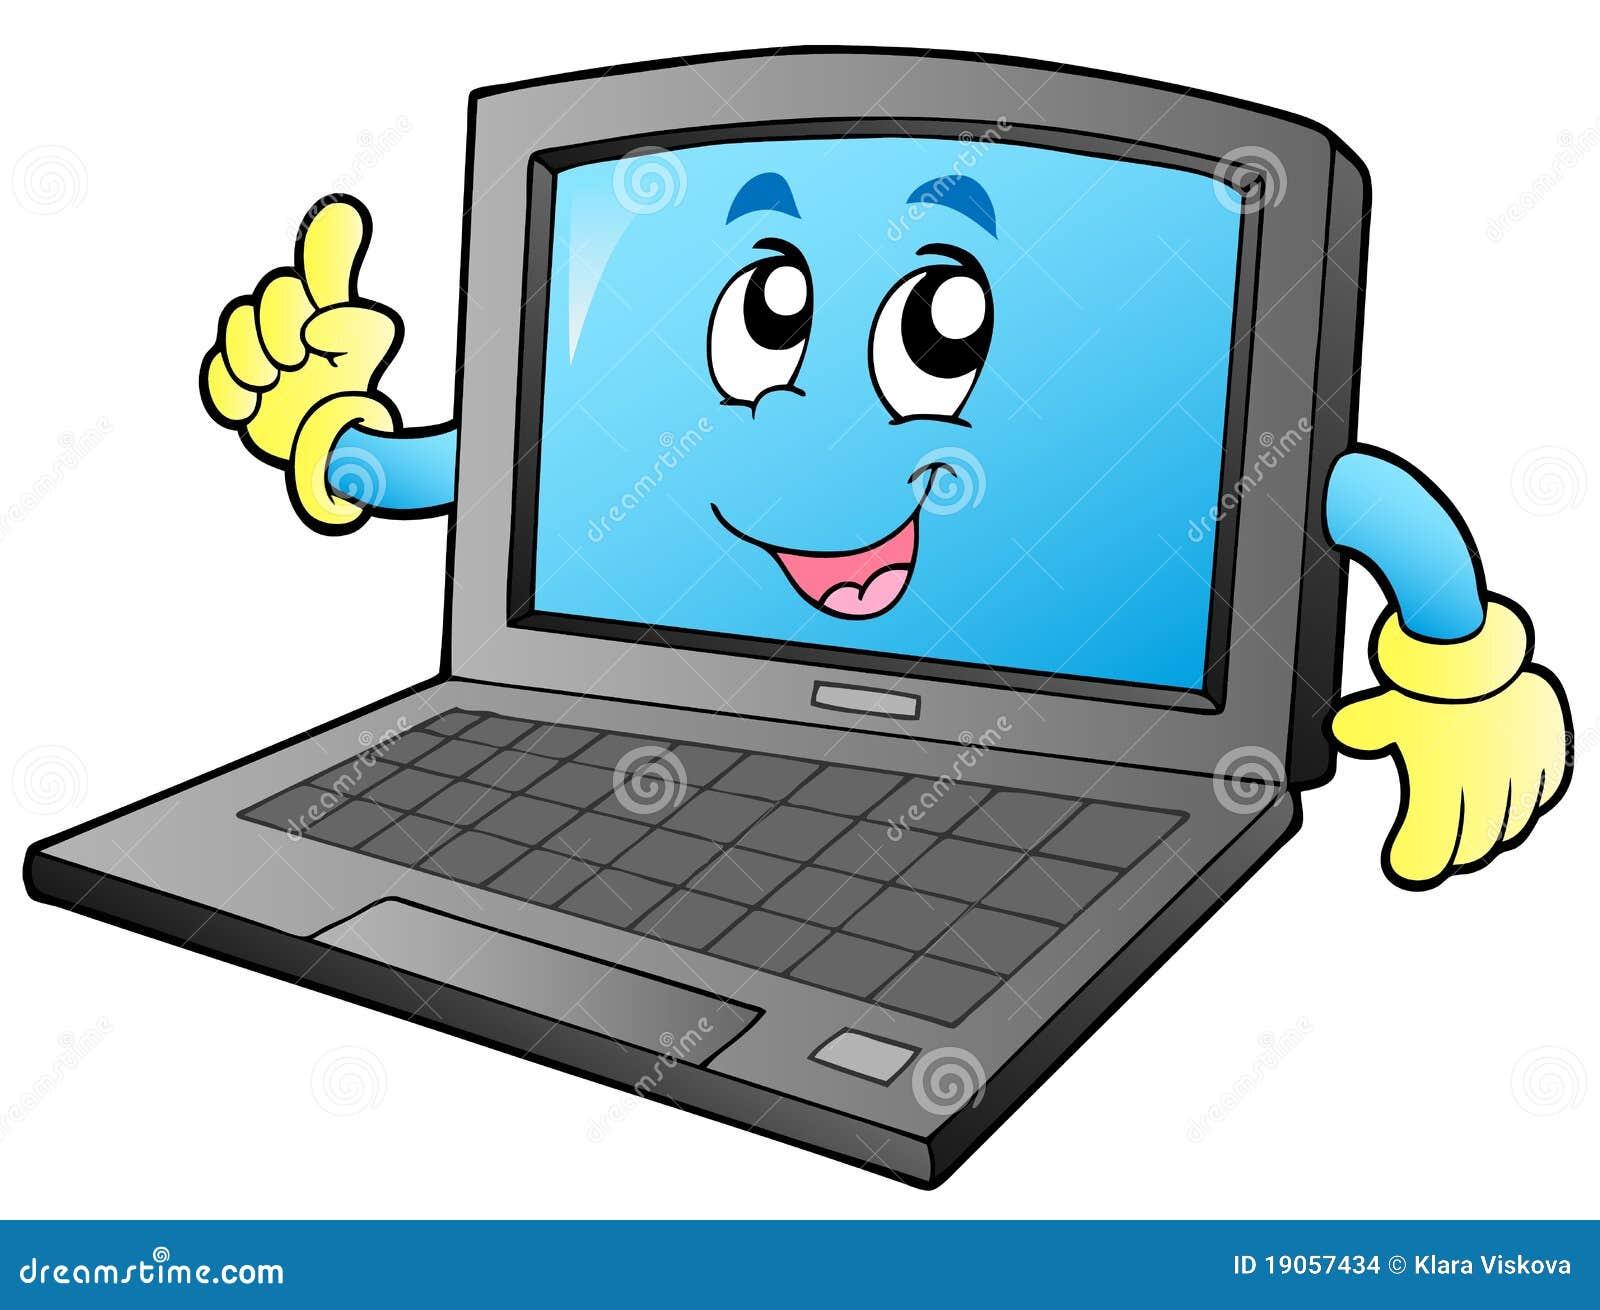 Cartoon Smiling Laptop Stock Images - Image: 19057434